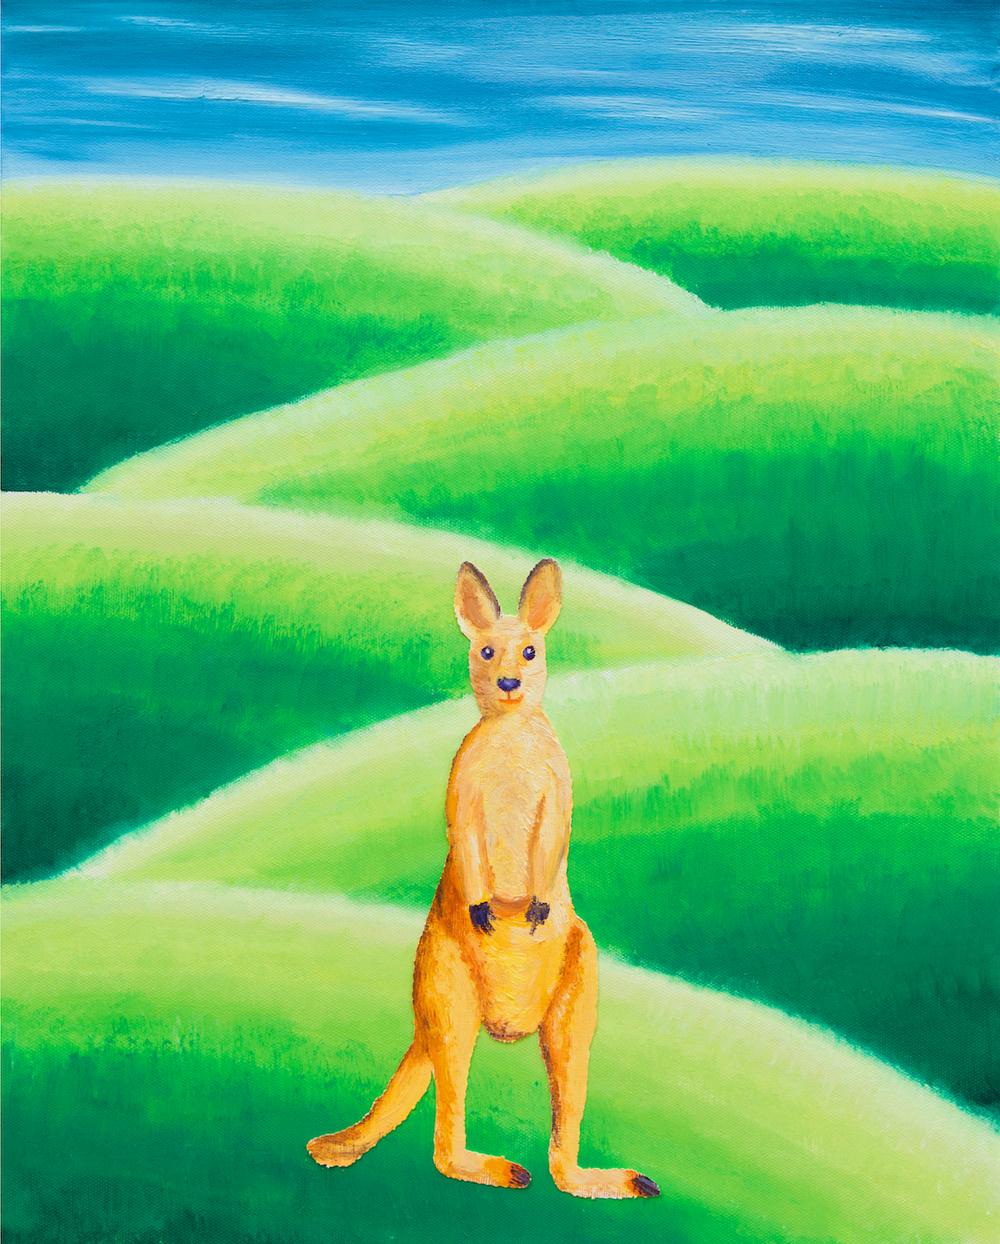 06_Kangaroo.jpg